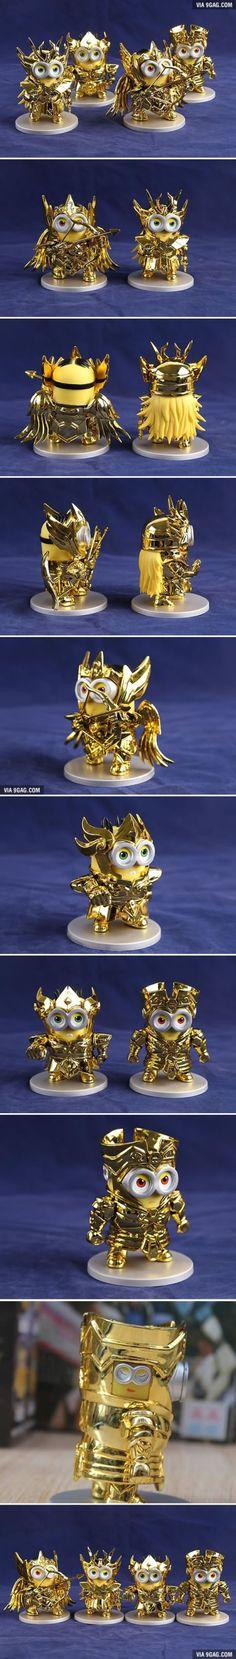 Minions Cosplay As Saint Seiya's Gold Saints